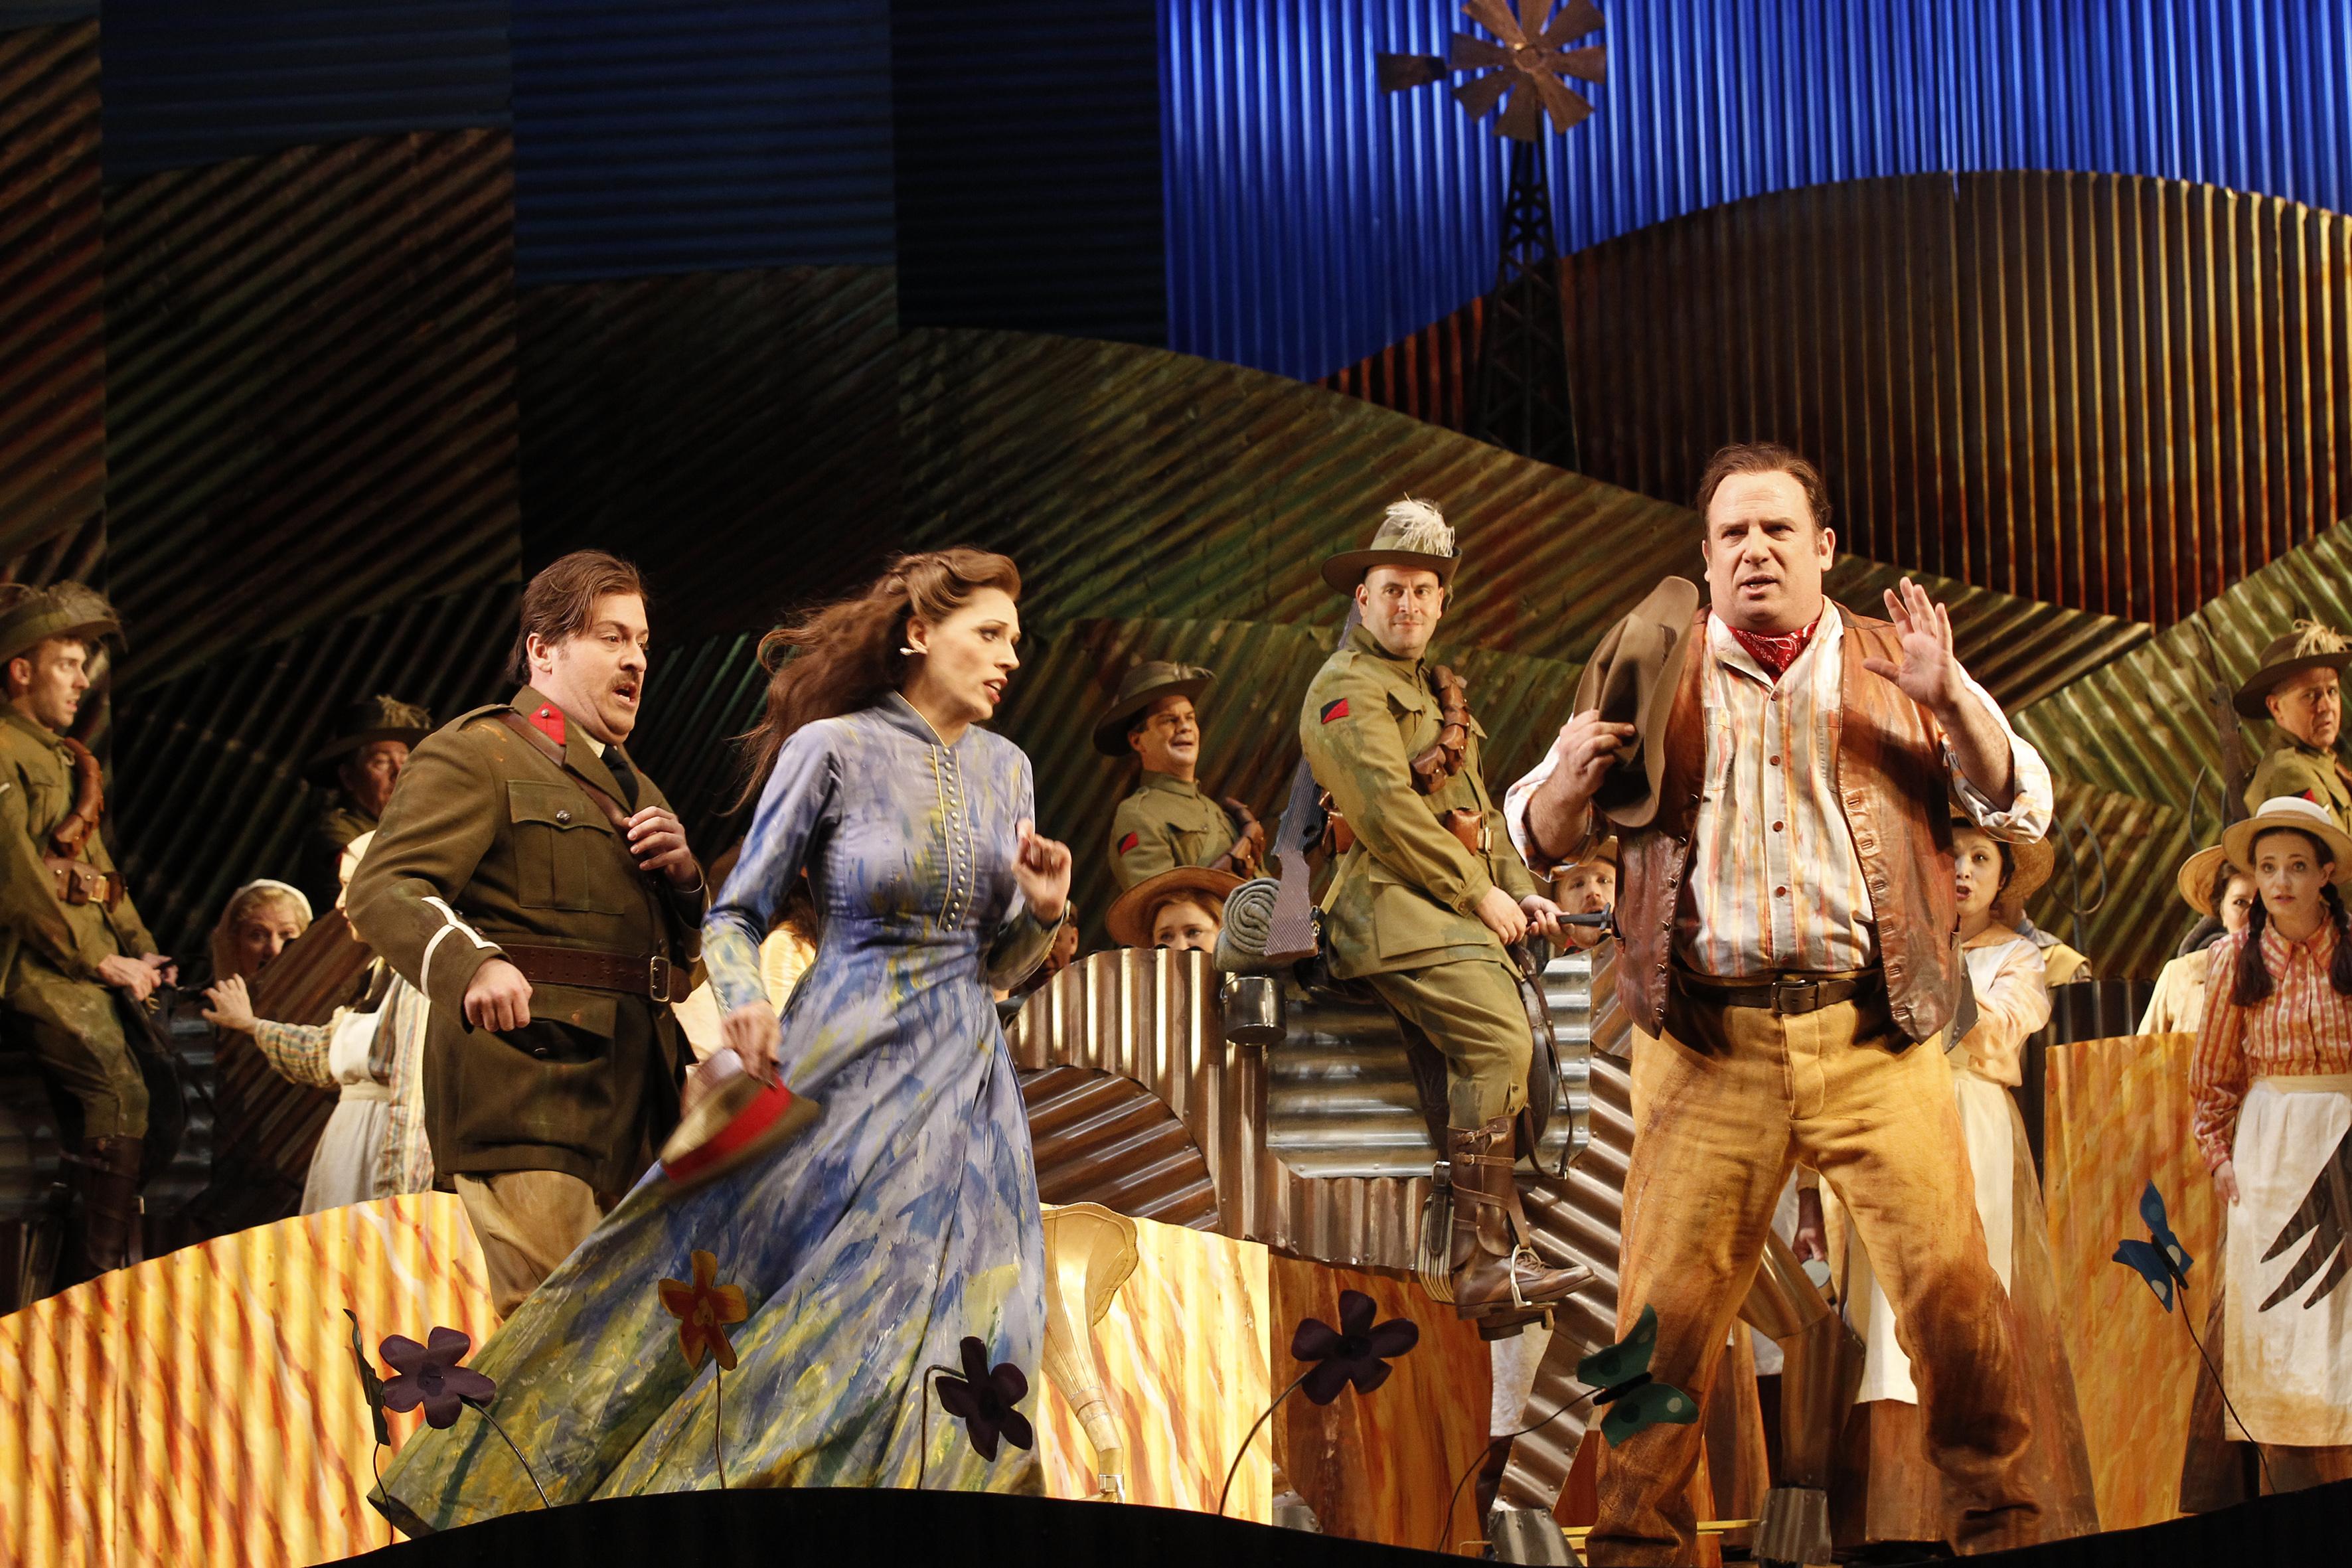 Christopher Hillier (Belcore), Rachelle Durkin (Adina) and Aldo Di Toro (Nemorino) in Opera Australia's The Elixir of Love.